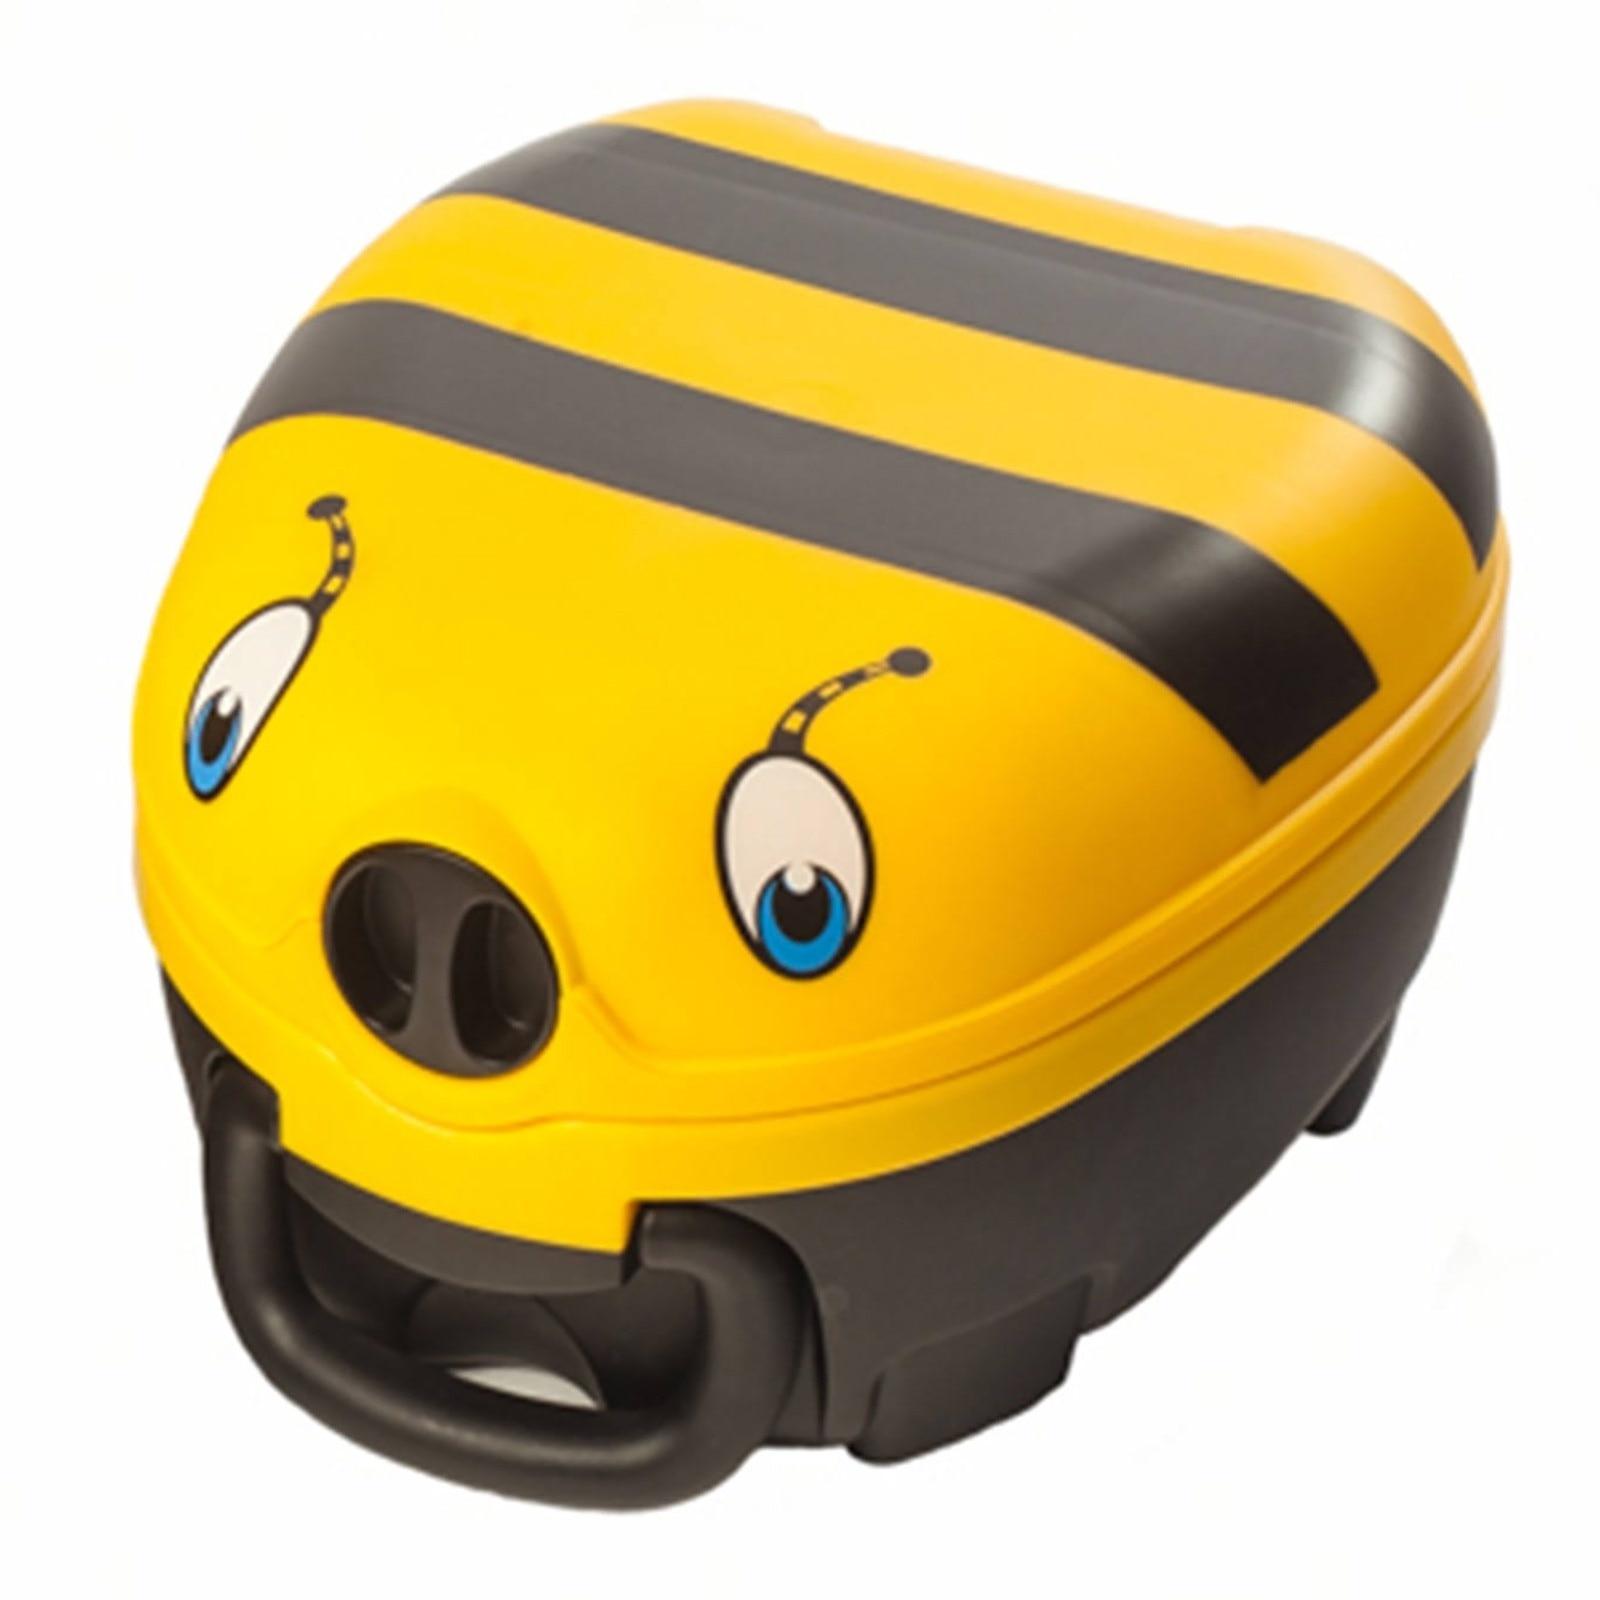 Ebebek My Carry Potty Baby Portable Educational